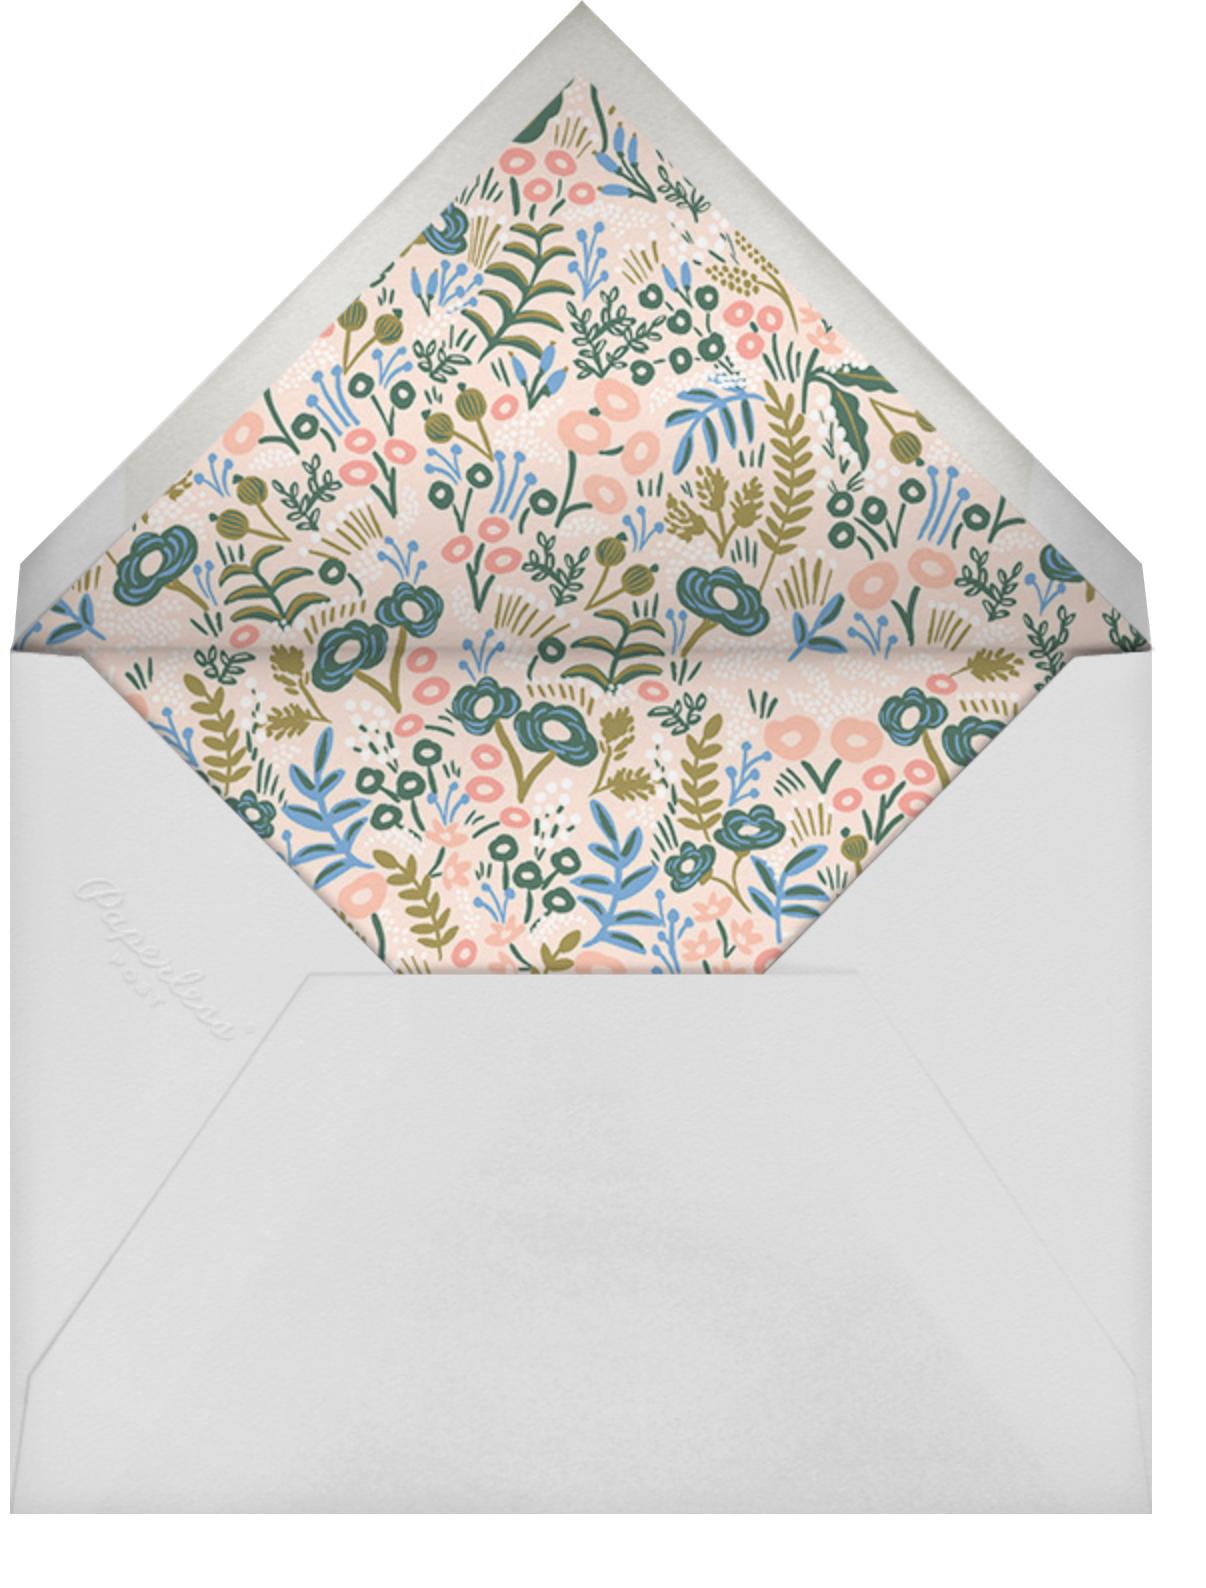 Floral Tapestry - Pavlova - Rifle Paper Co. - Envelope